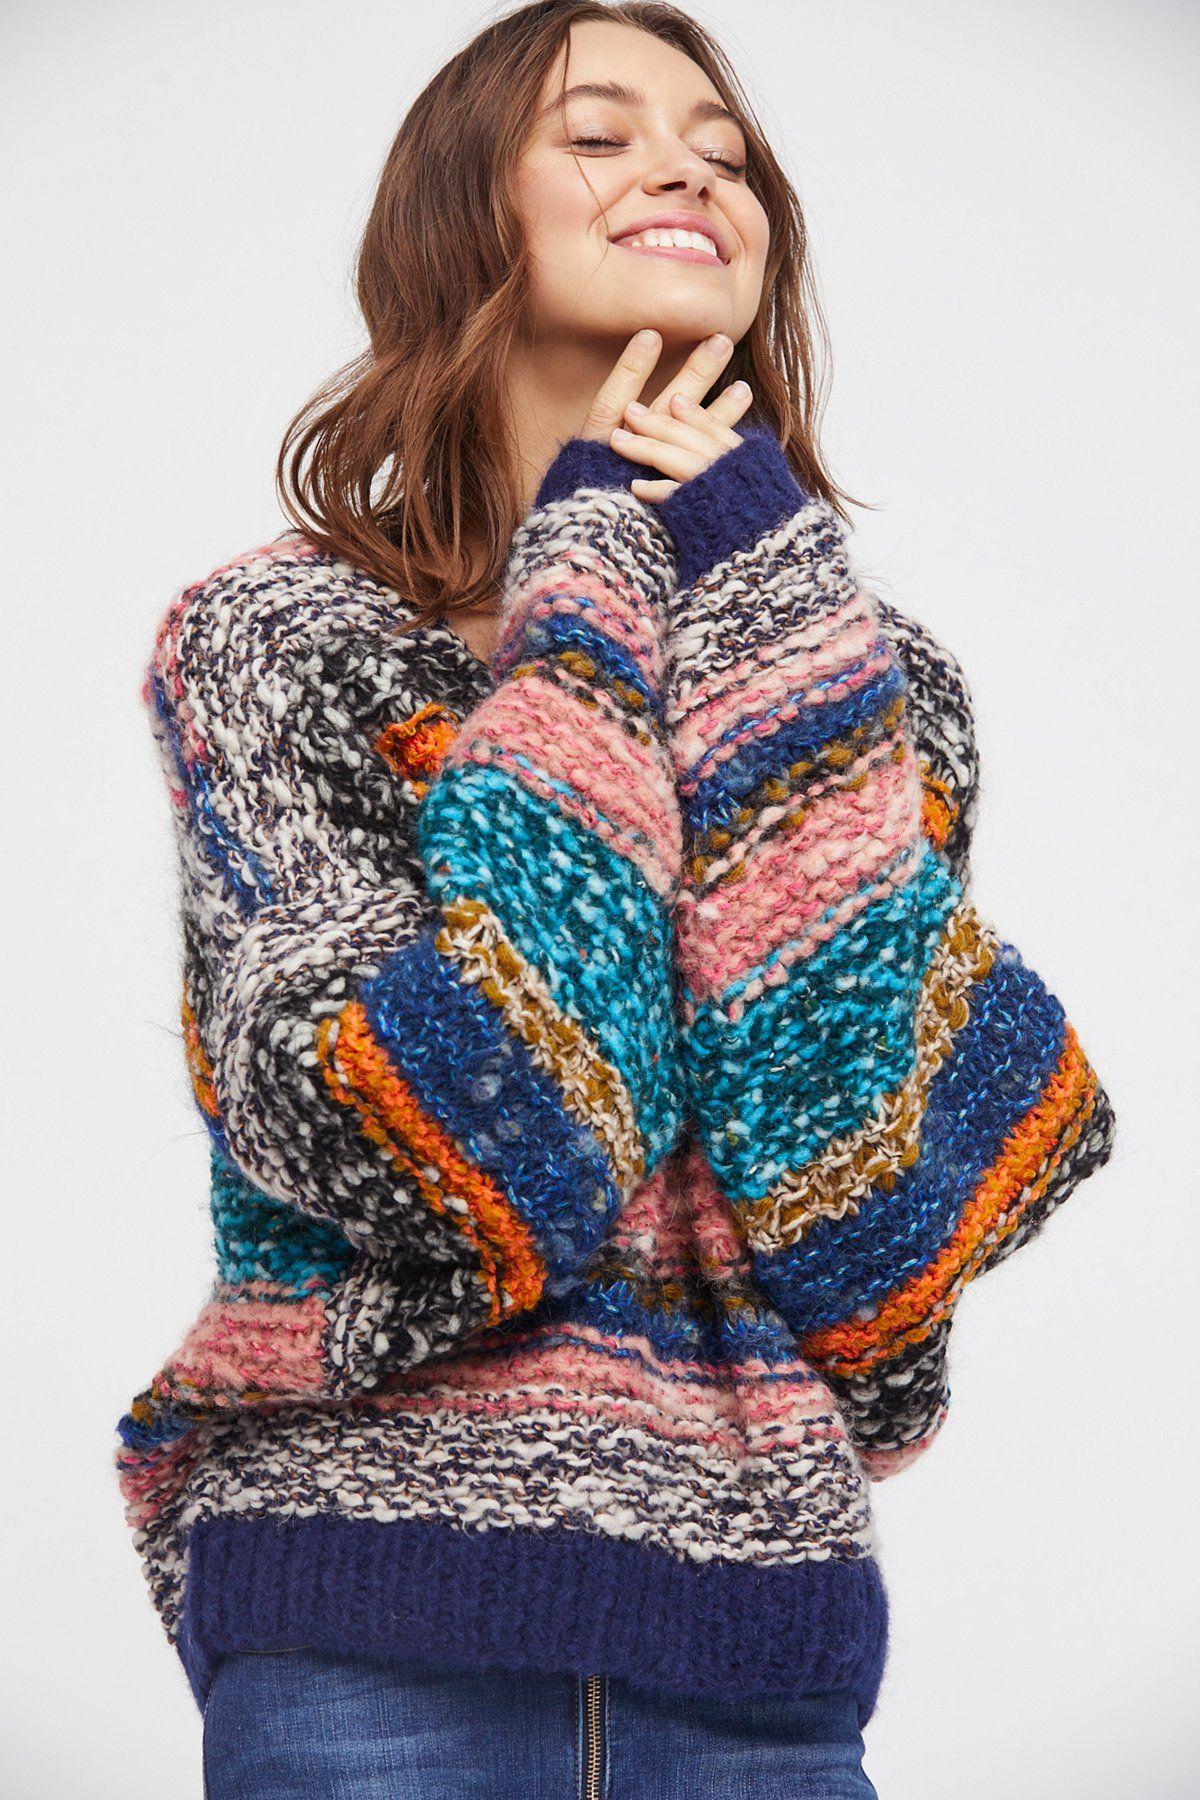 379abec5a4e8 Crazy Stripe Pullover Knitwear Fashion